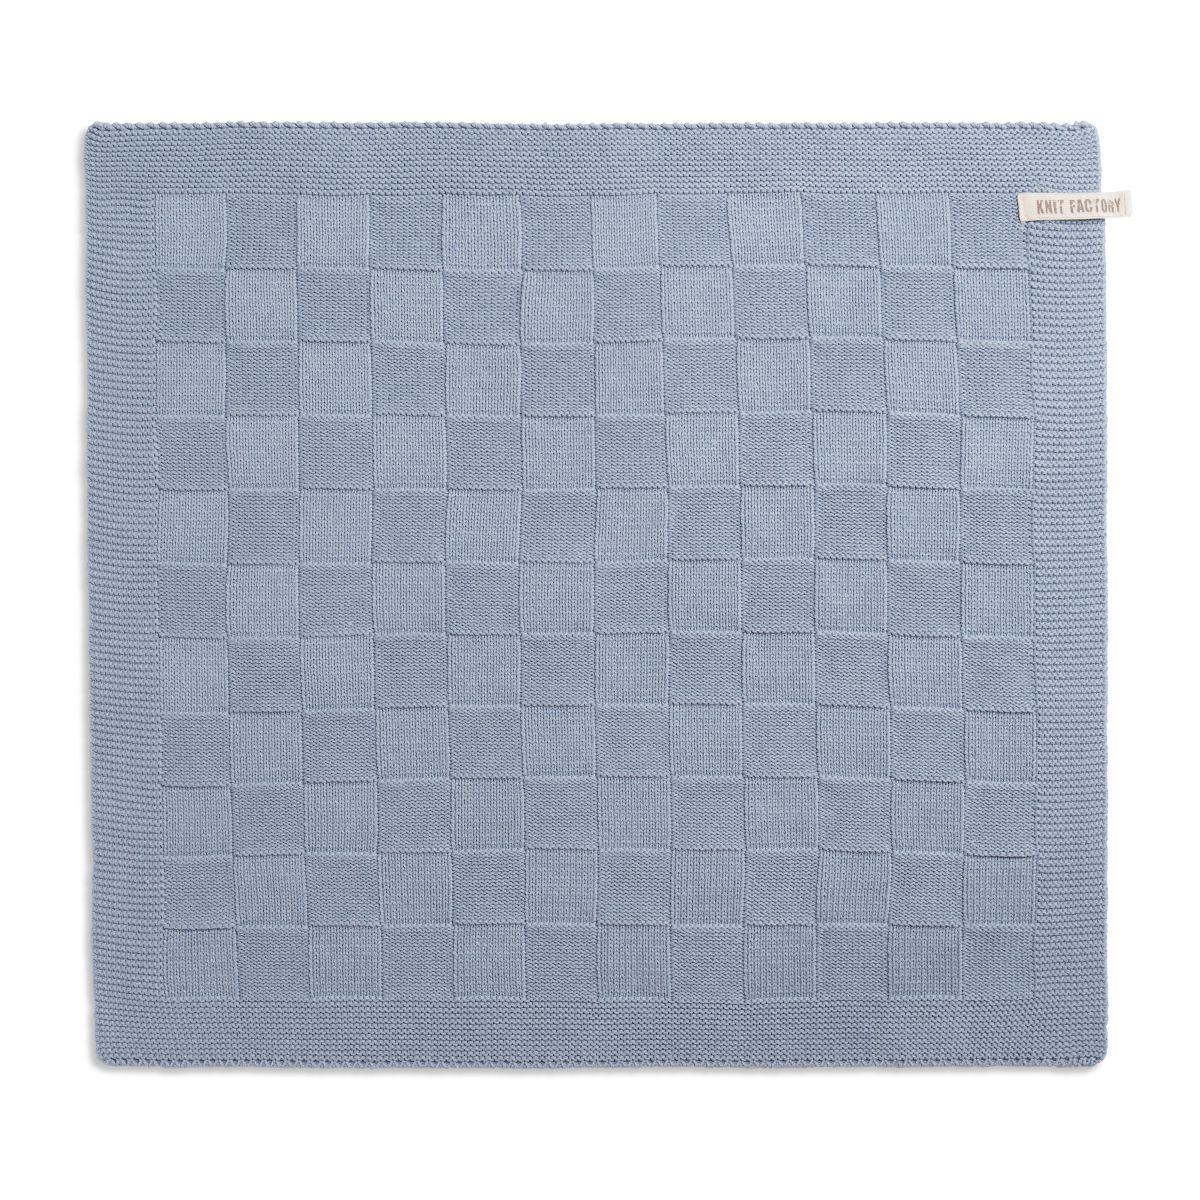 knit factory 2000011 keukendoek grote blok uni licht grijs